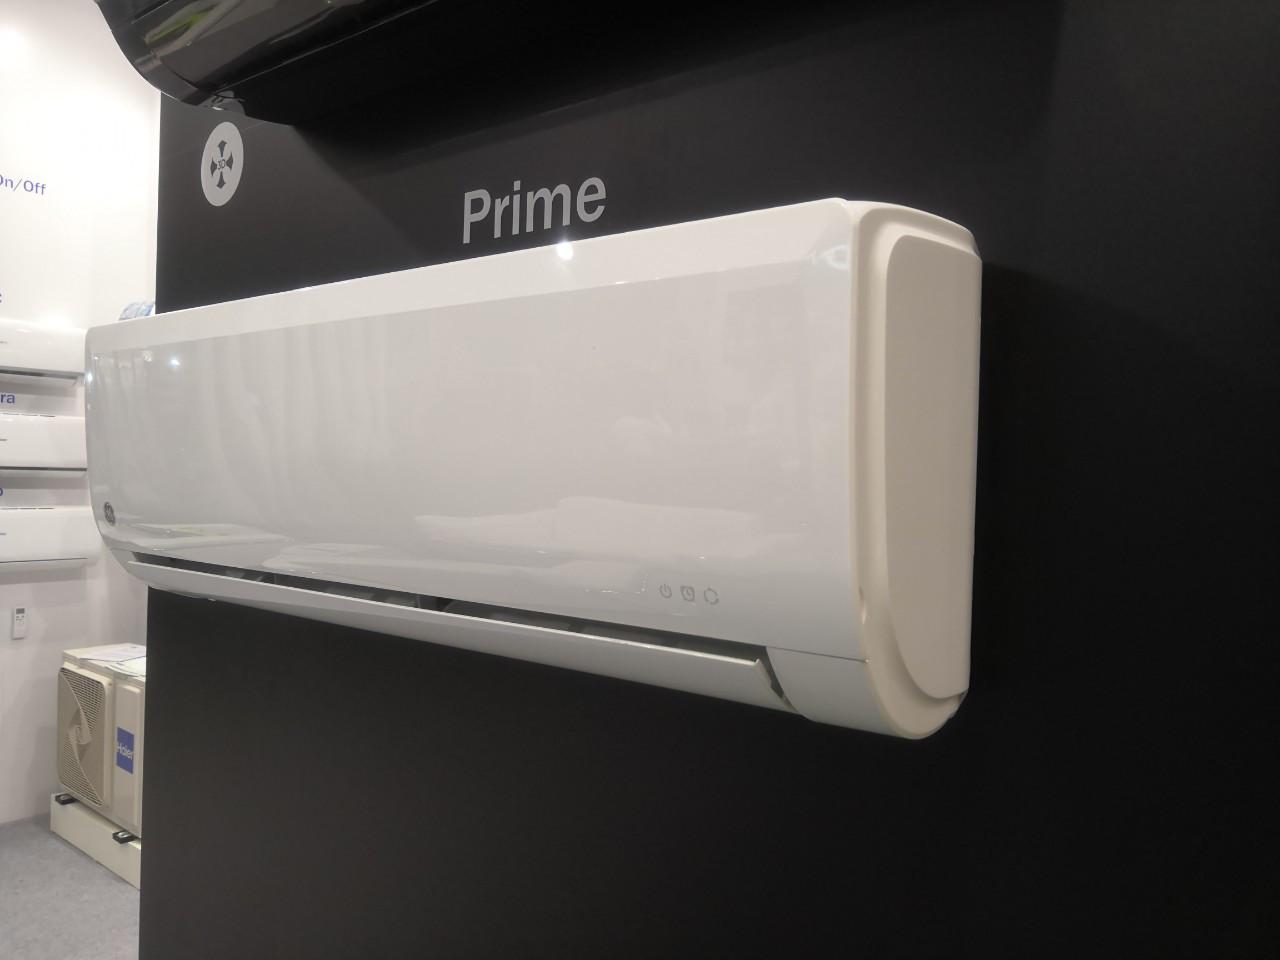 НОВИНКА!!! Кондиционер General Electric PRIME GES-NMG50IN Invertor (-15oC)